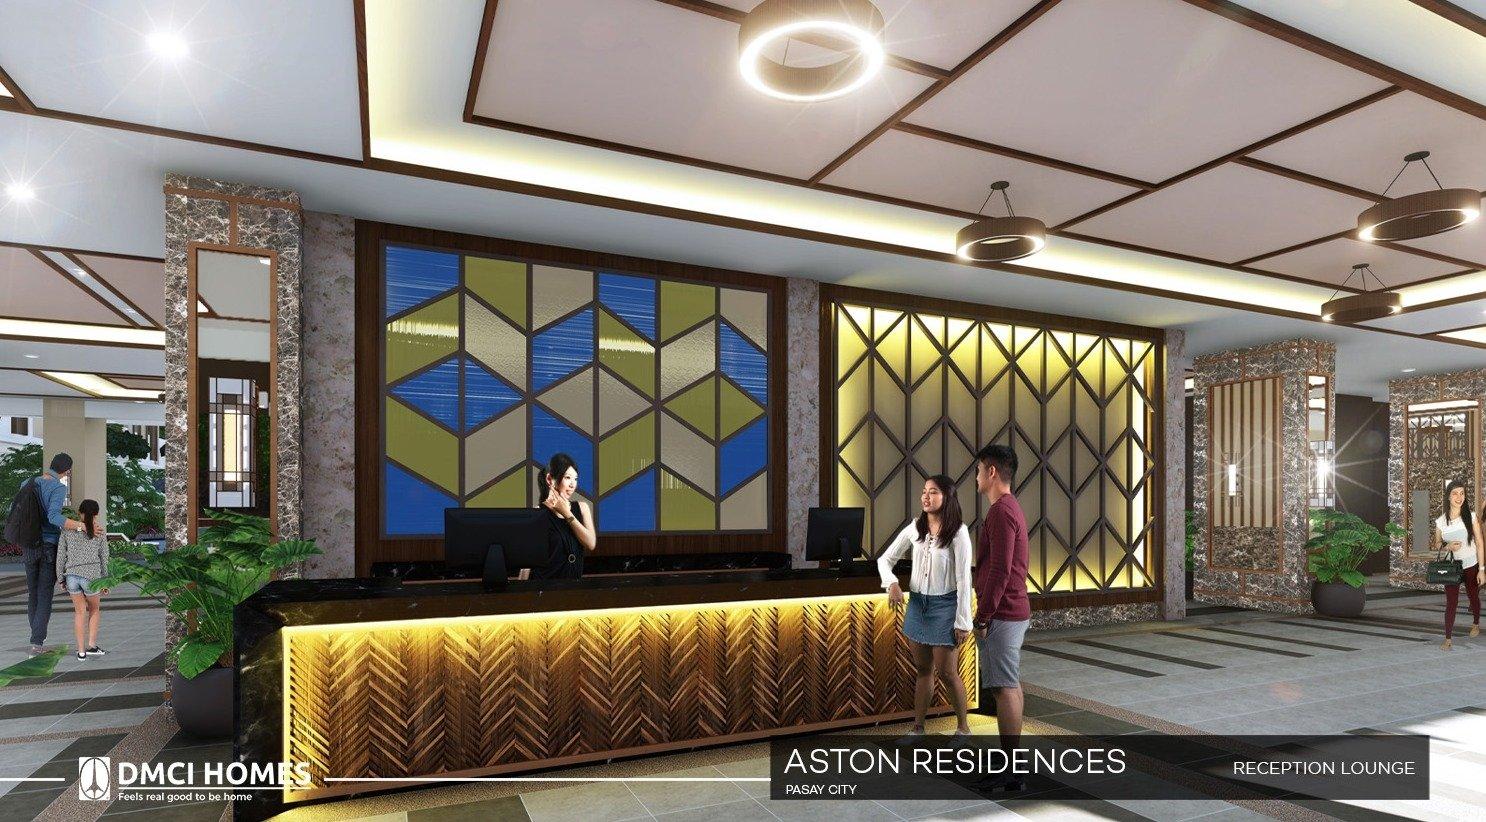 Aston Residences-Reception Lounge-large